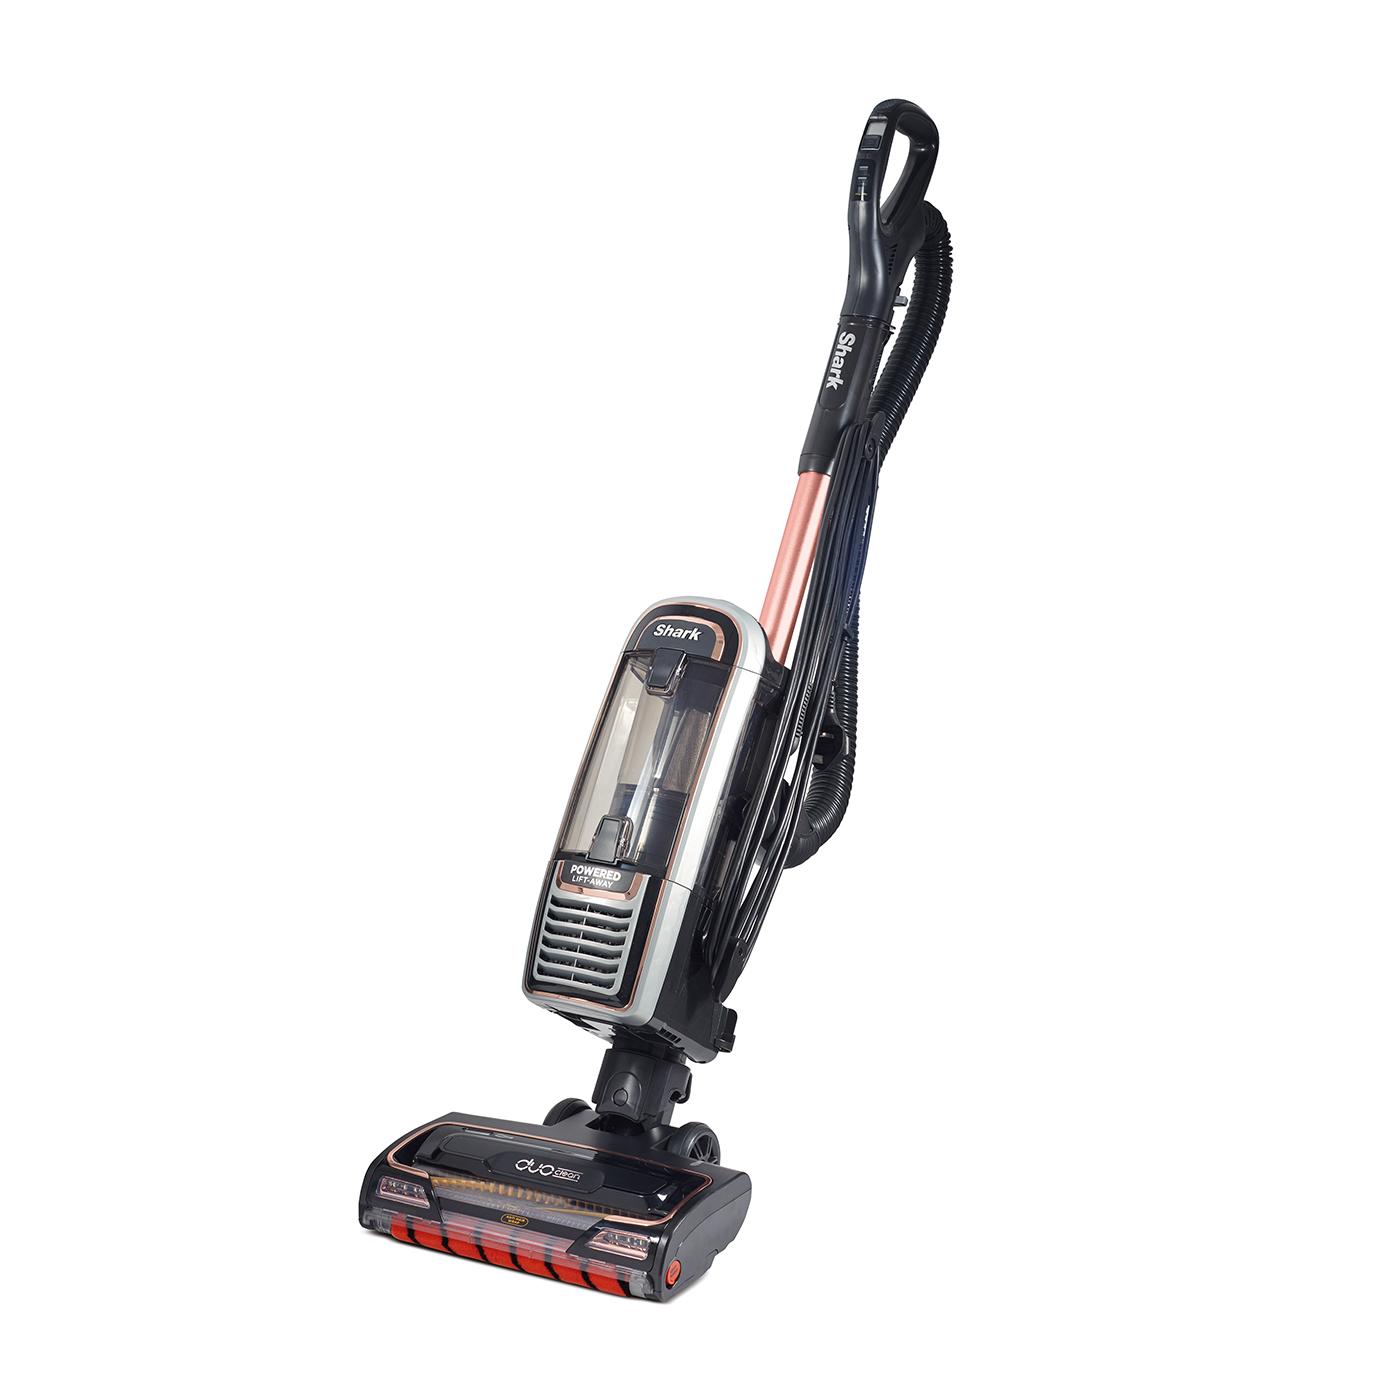 Shark Anti Hair Wrap Upright Vacuum Cleaner, Pet Model AZ910UKT